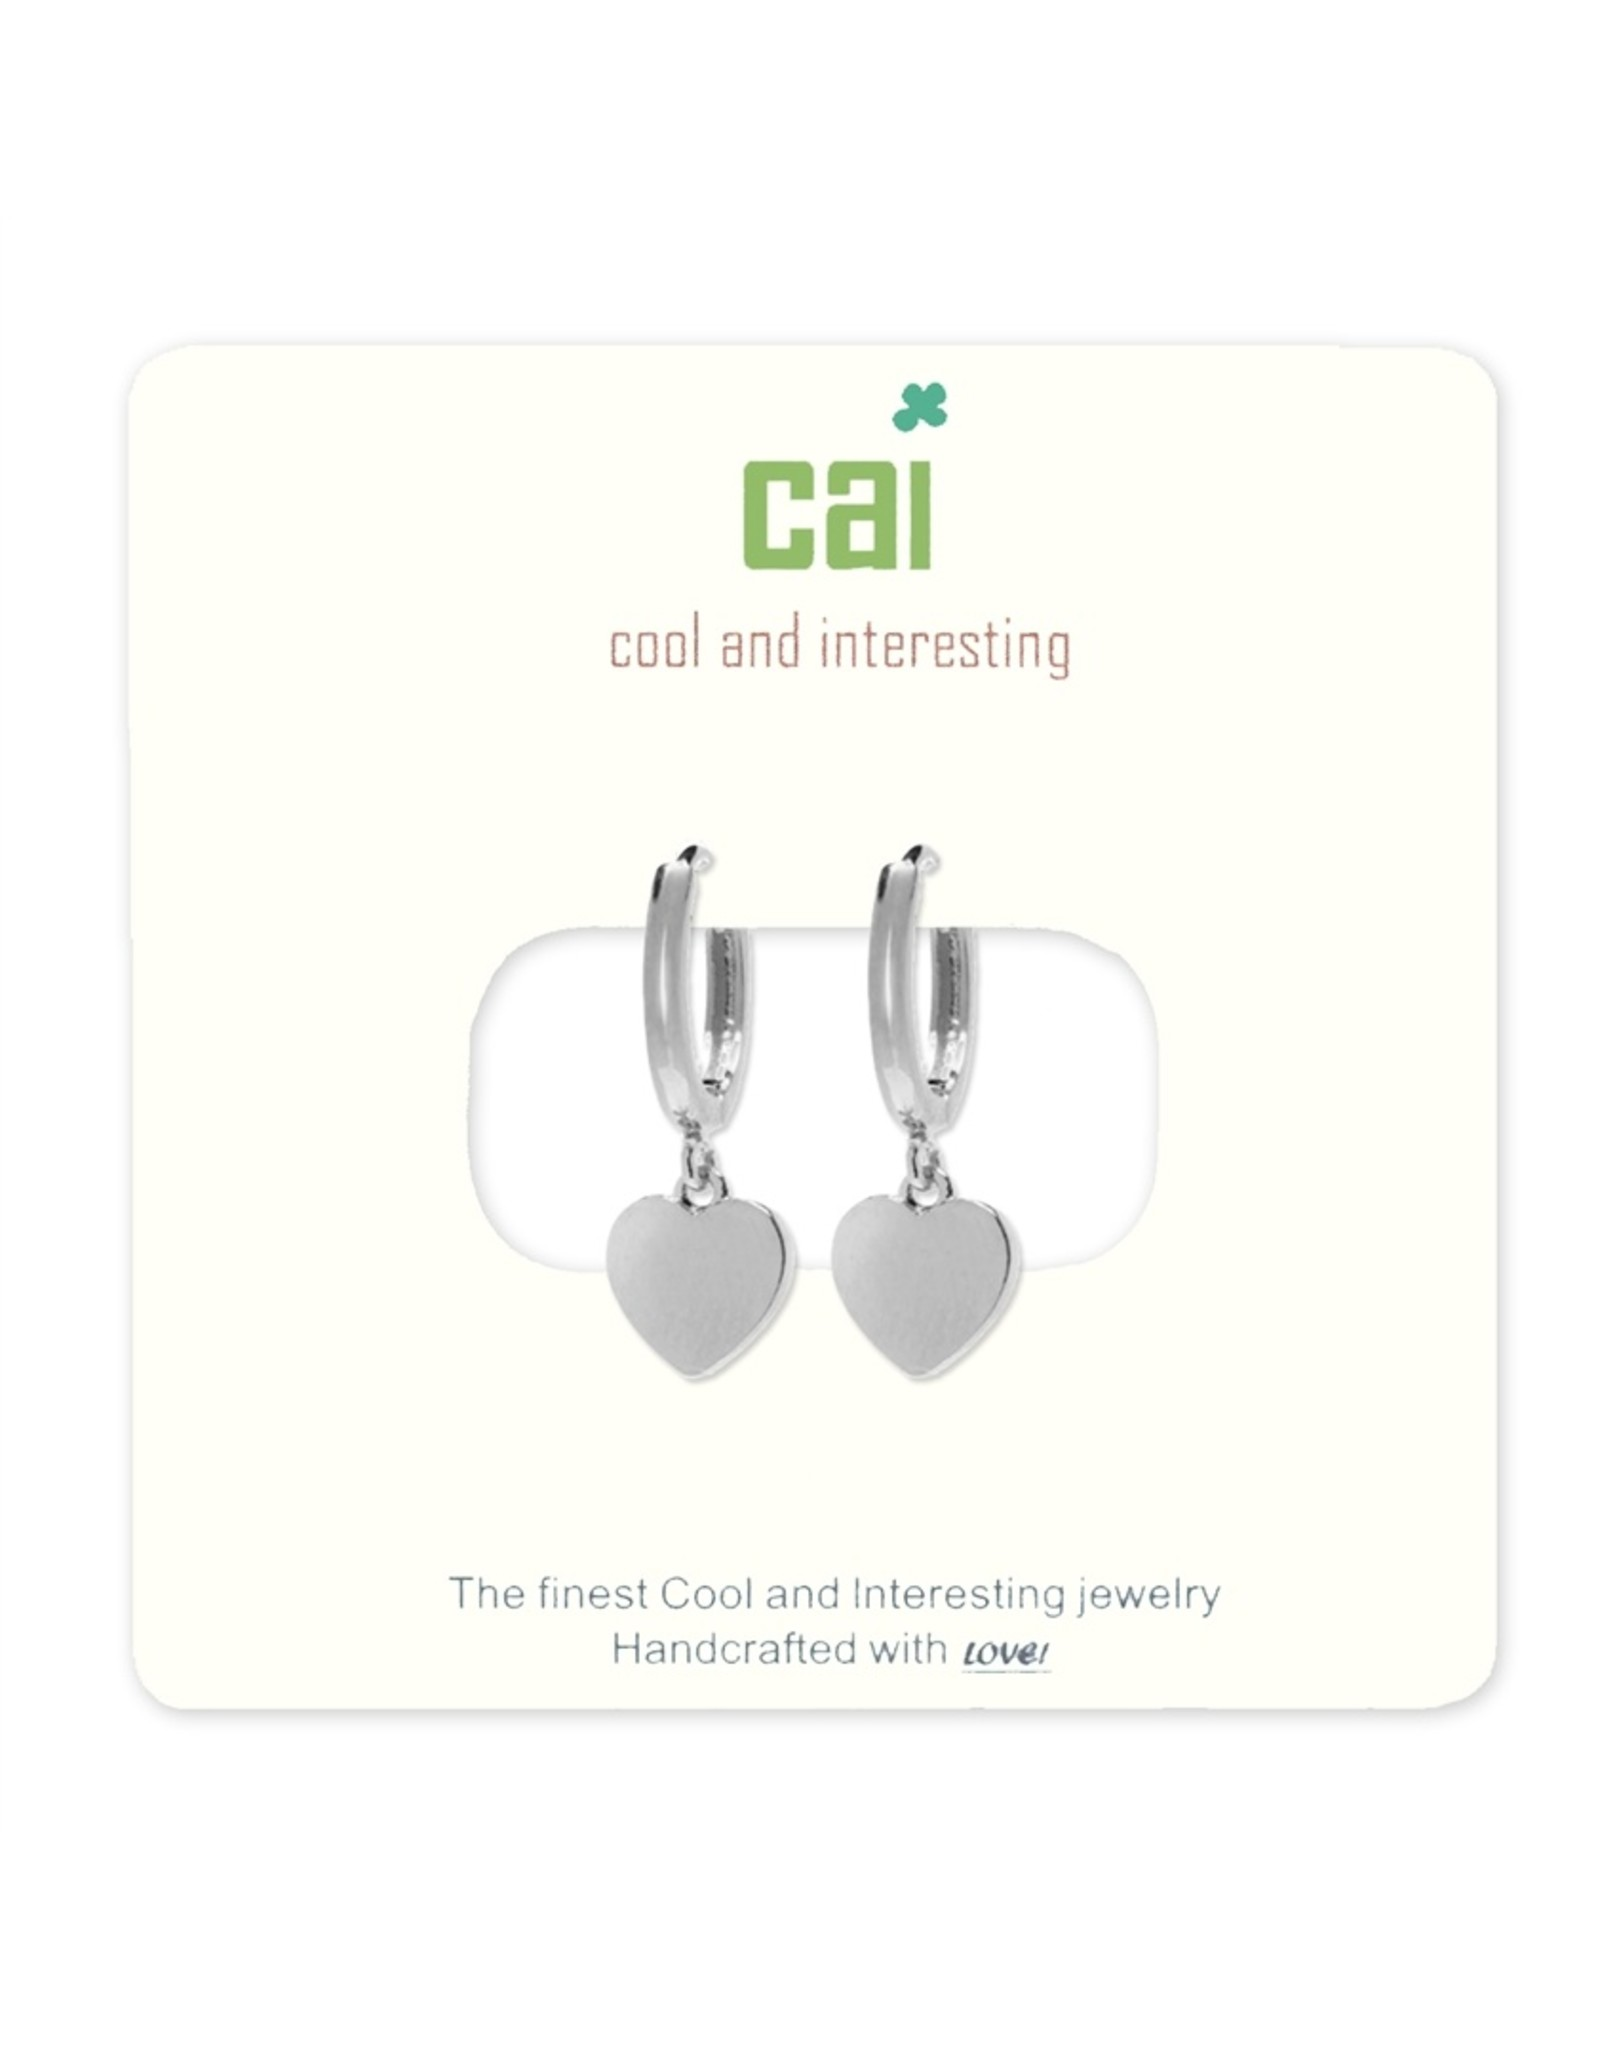 CAI Silver Huggies Earrings, heart